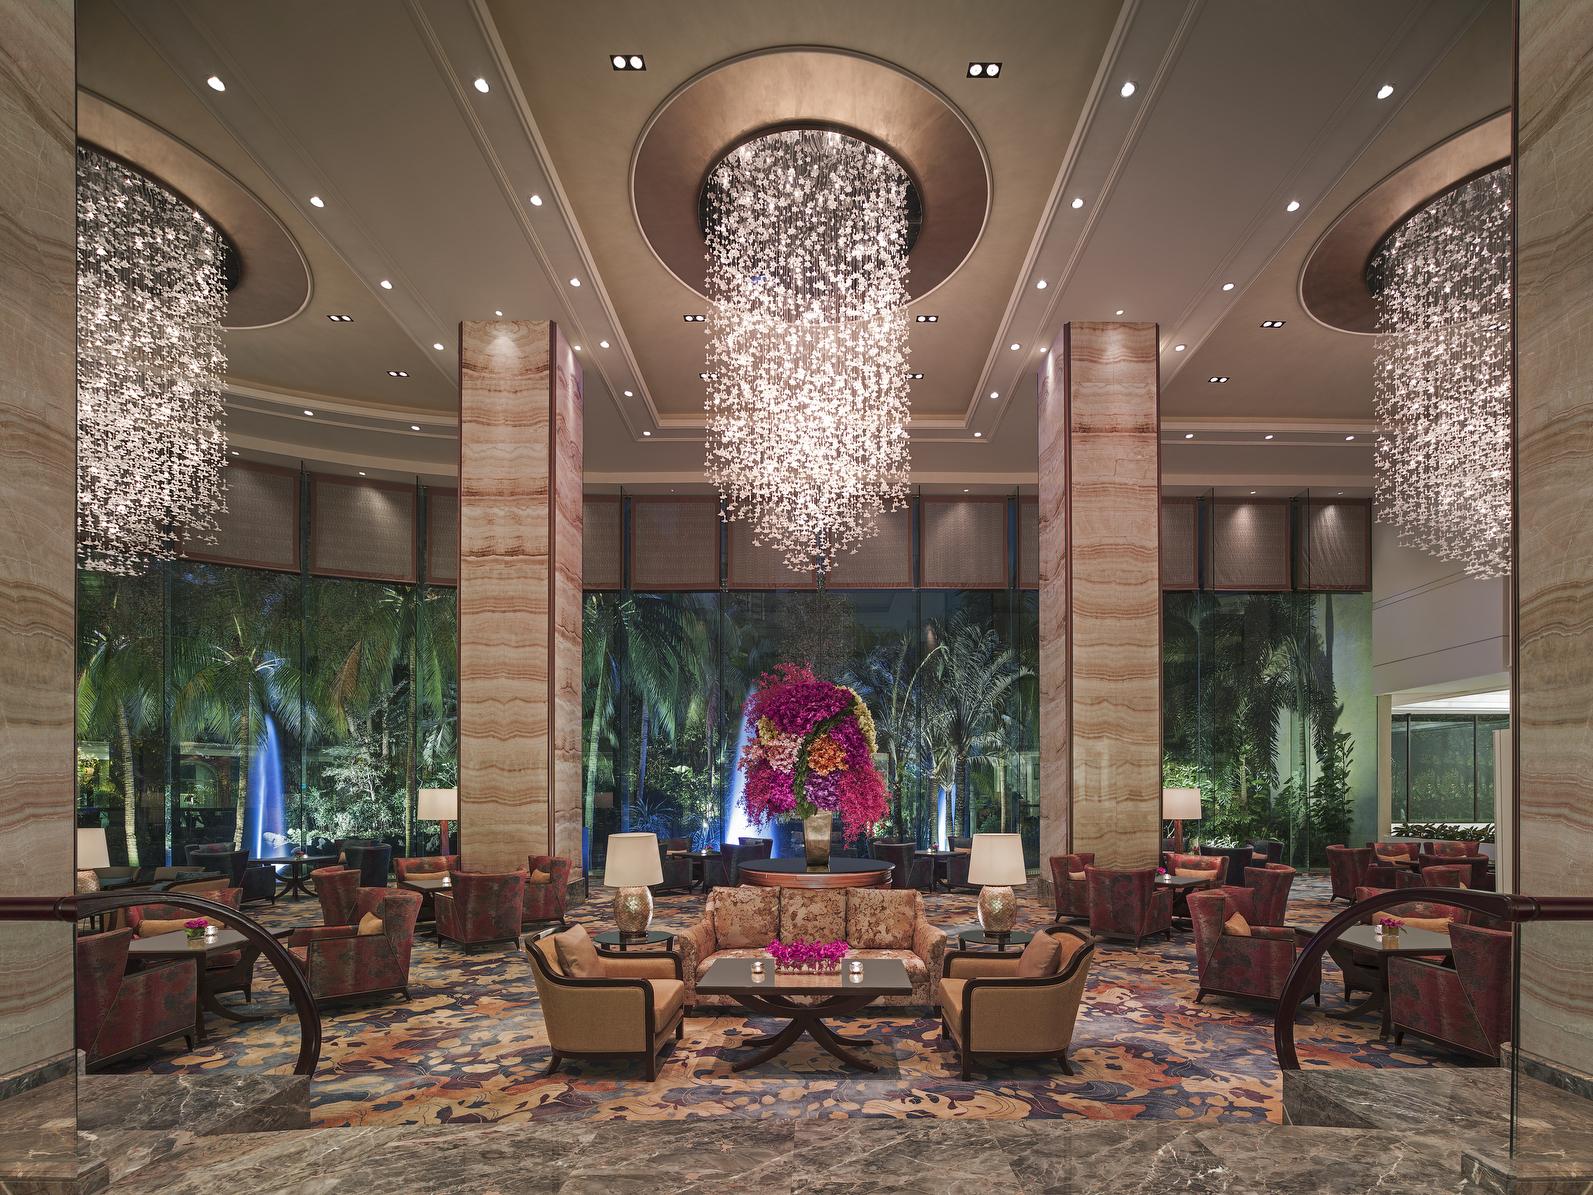 Beautiful Lounge area at the lobby of EDSA Shangri-La Hotel